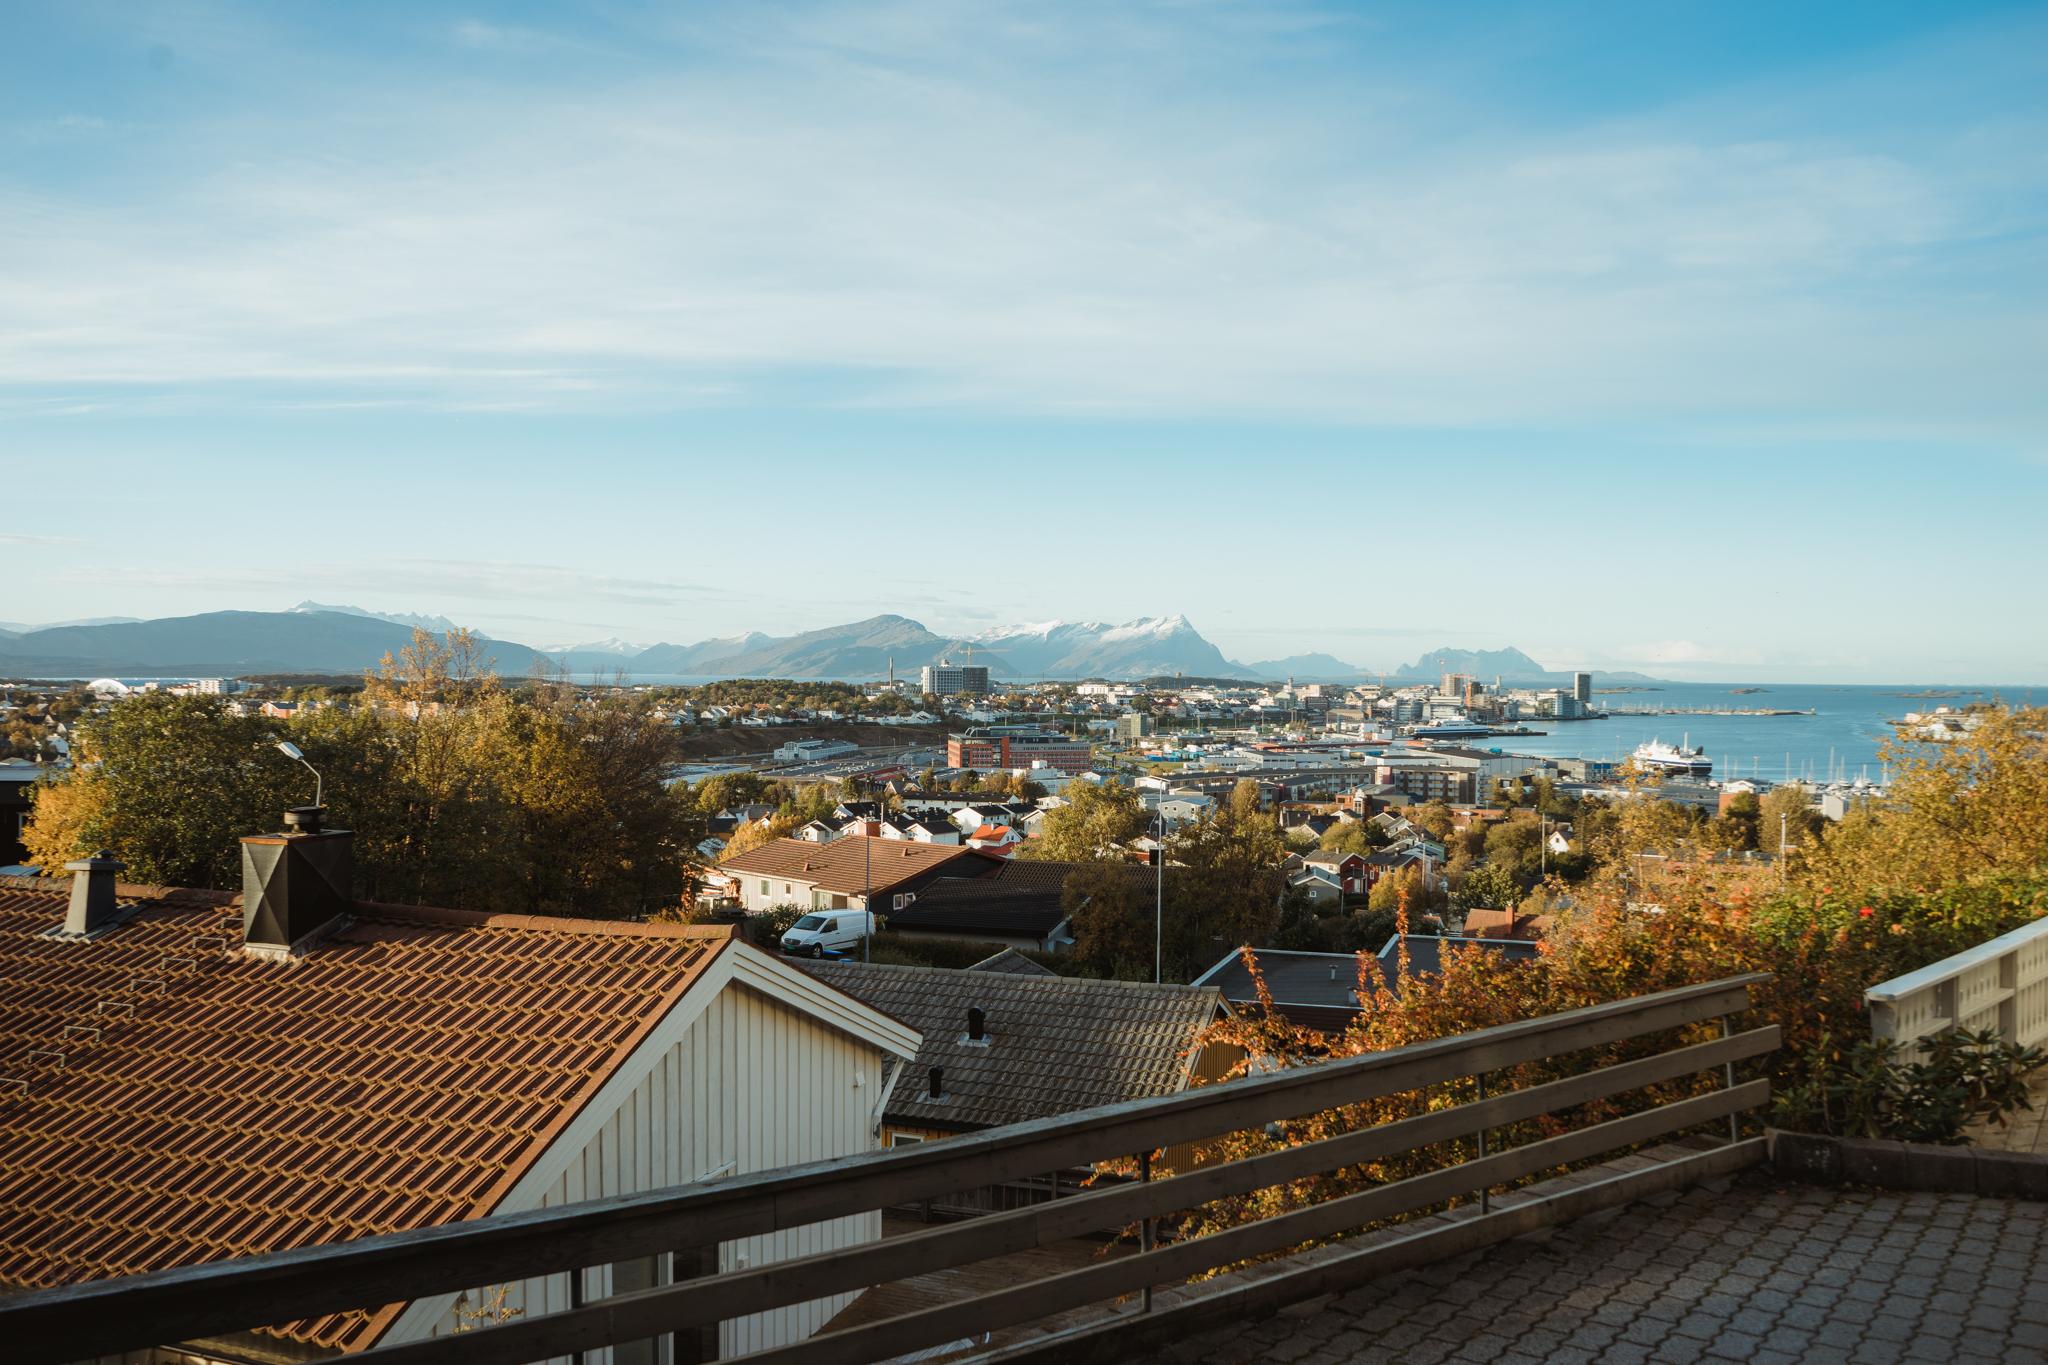 Vista de Bodø por la mañana.